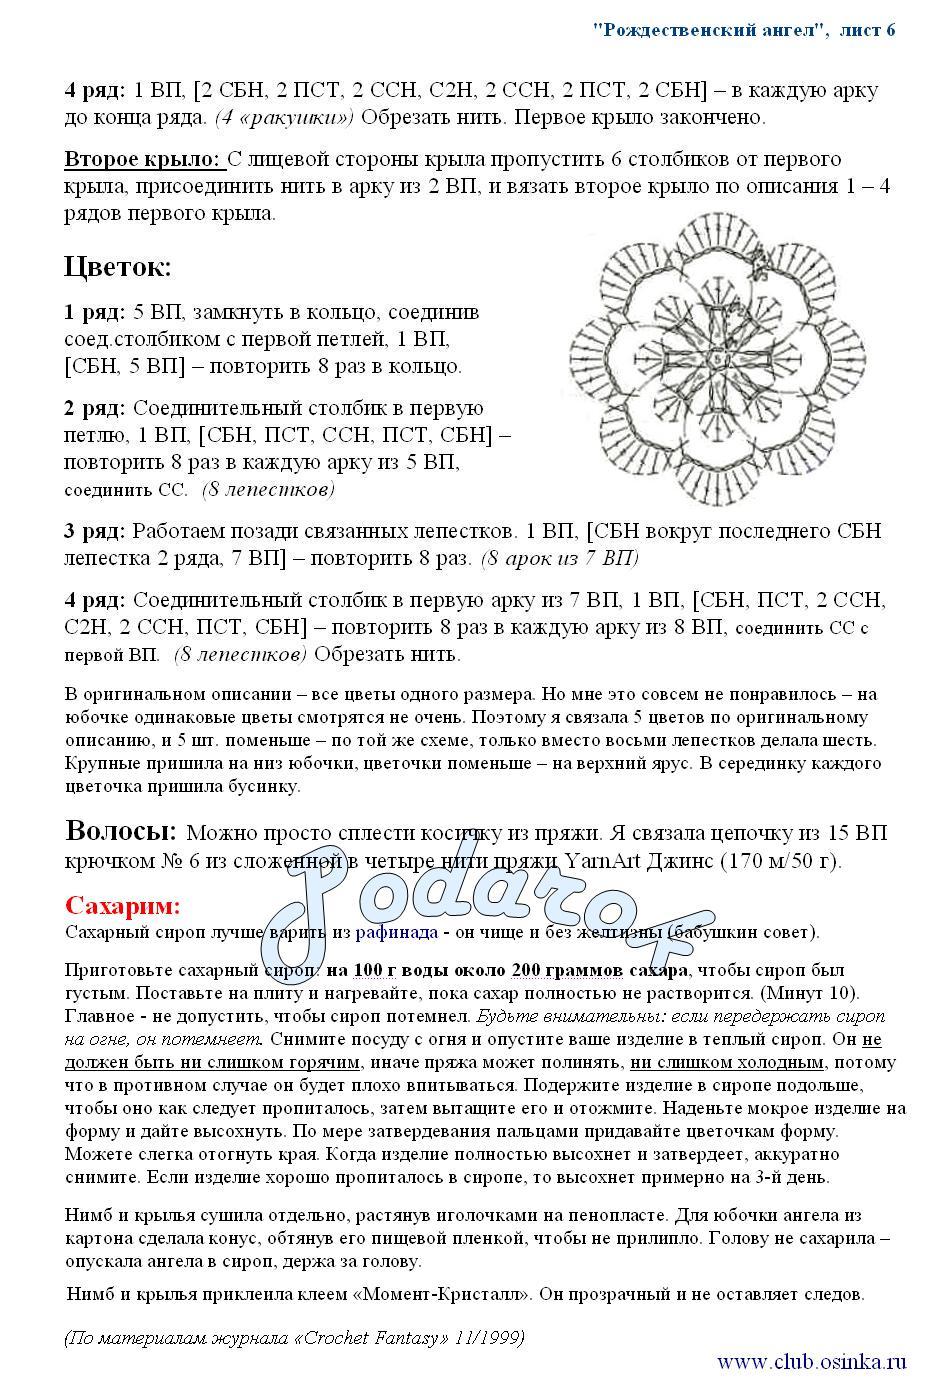 http://img-fotki.yandex.ru/get/5800/podaroknatka.2b/0_3fcb9_c430de04_orig.jpg